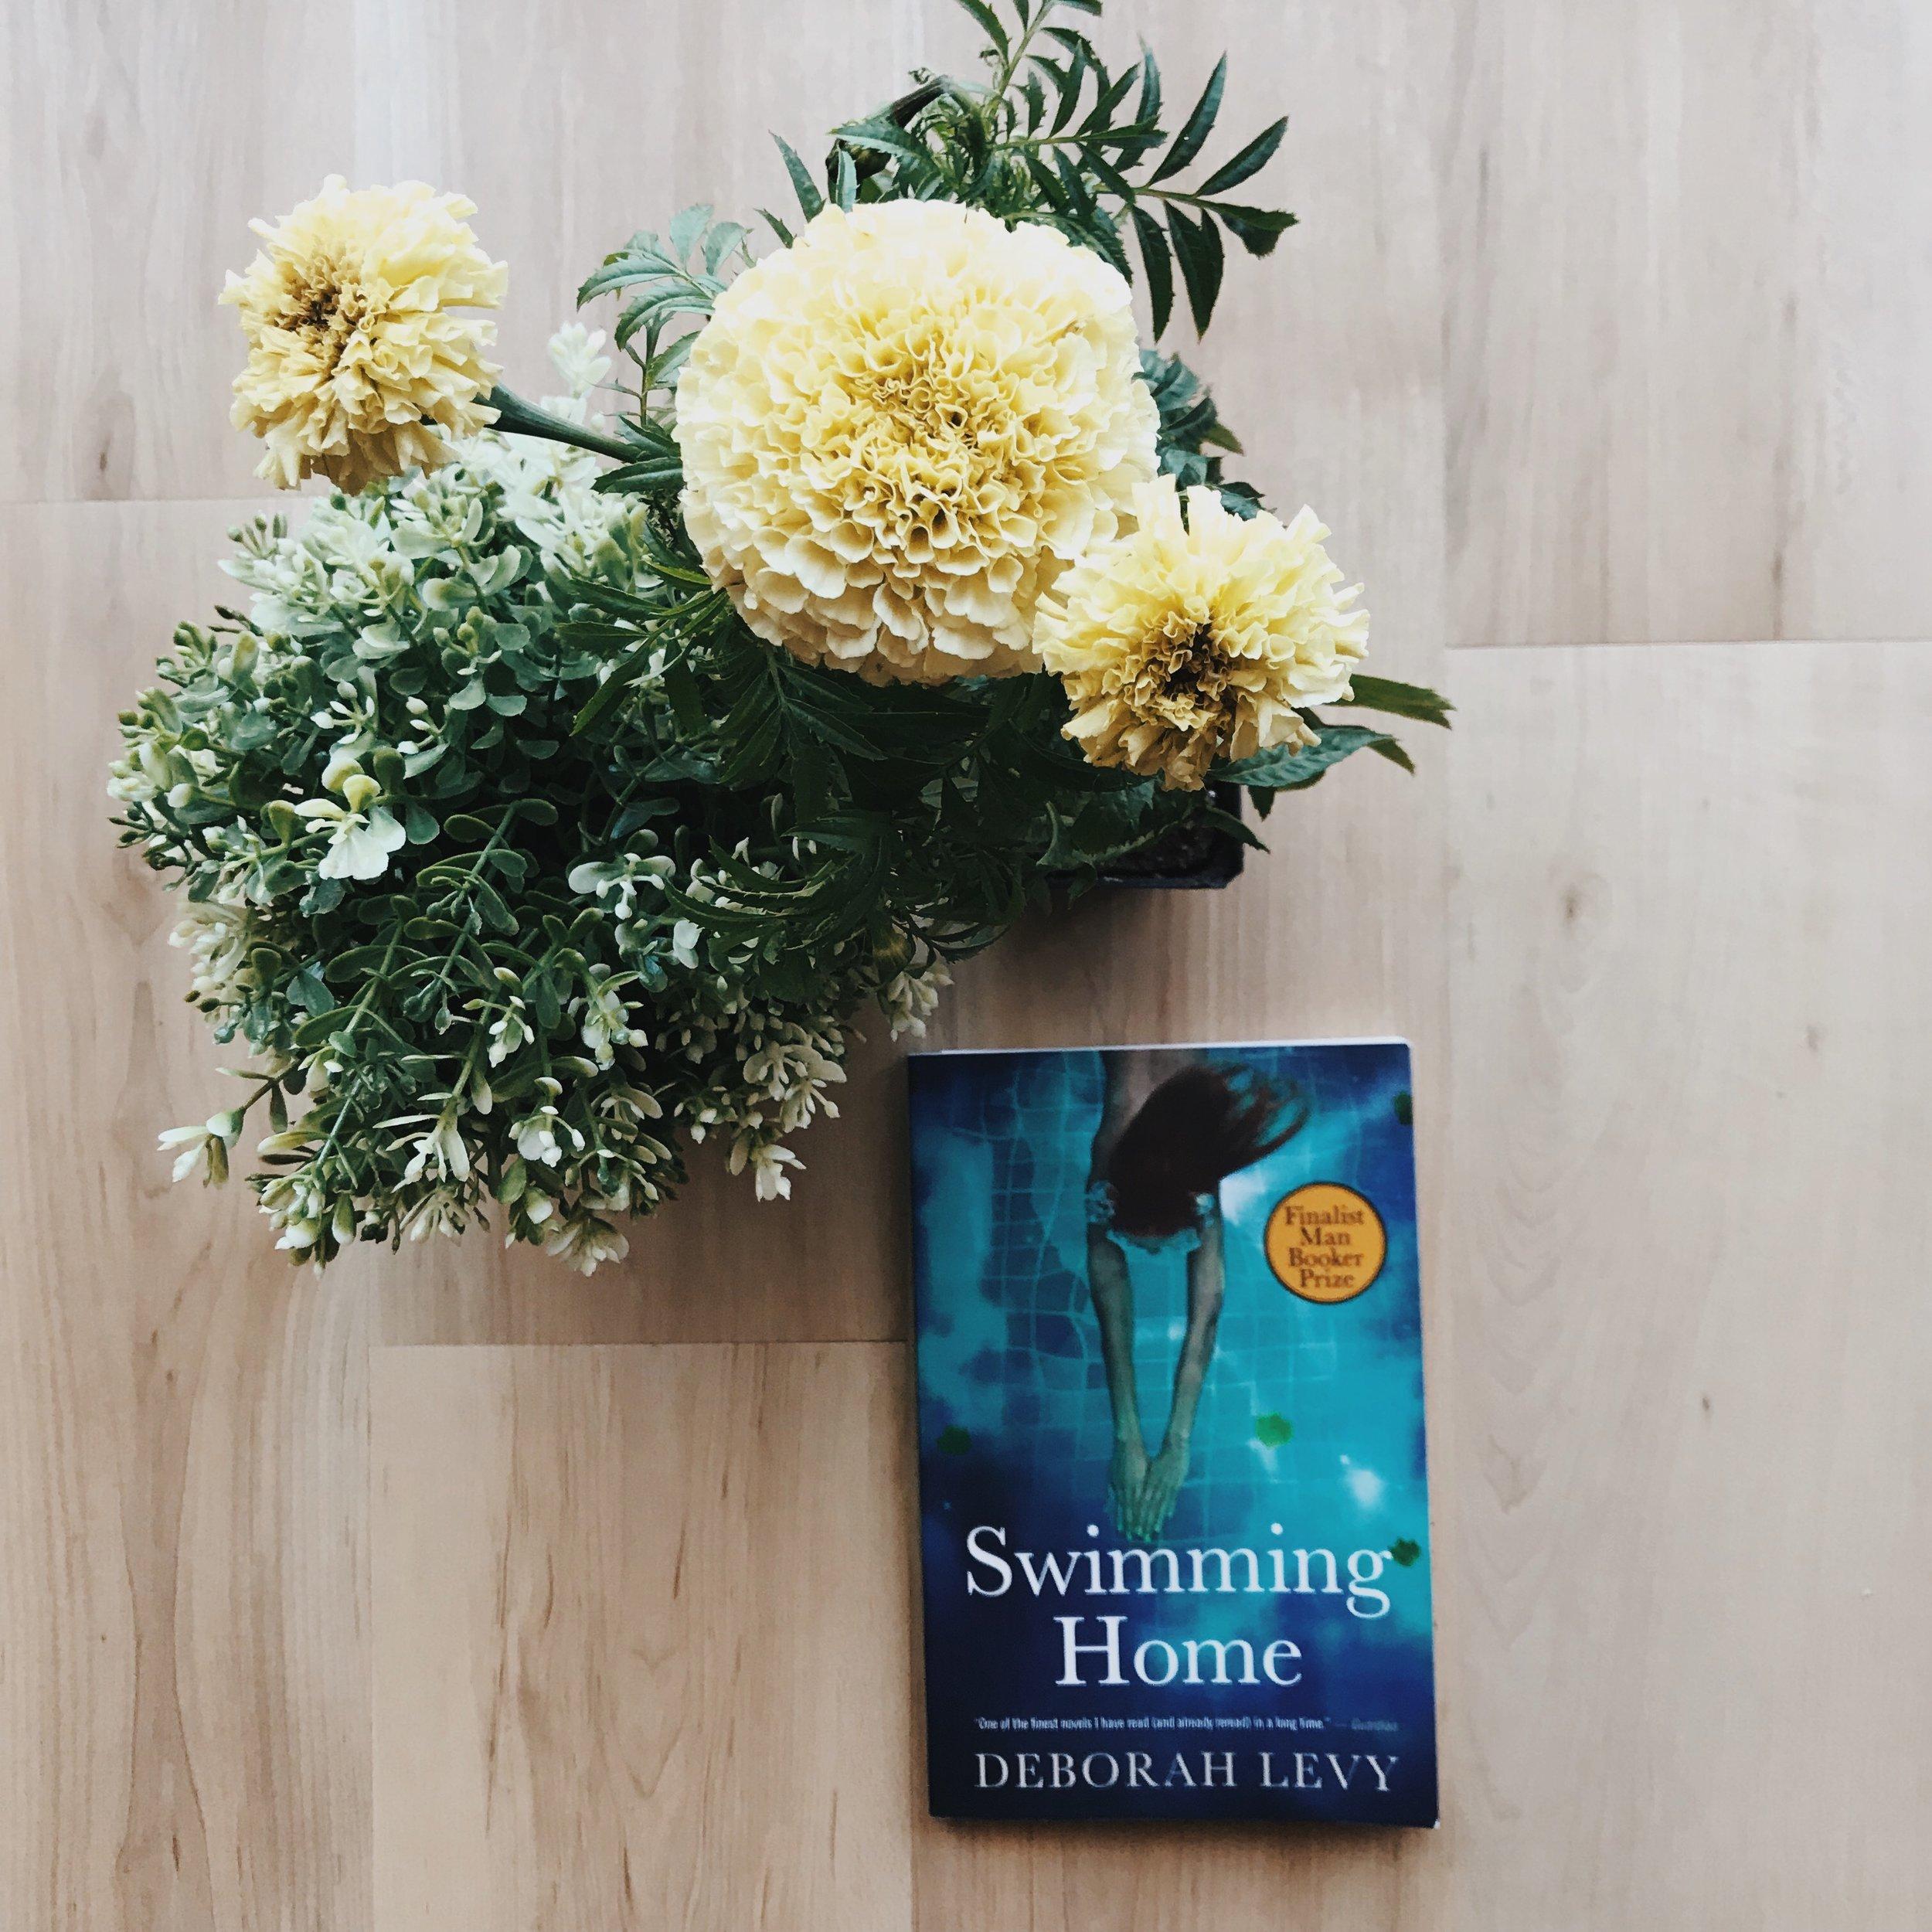 Vesna Curlic Summer Reads 2019 The Attic on Eighth.JPG